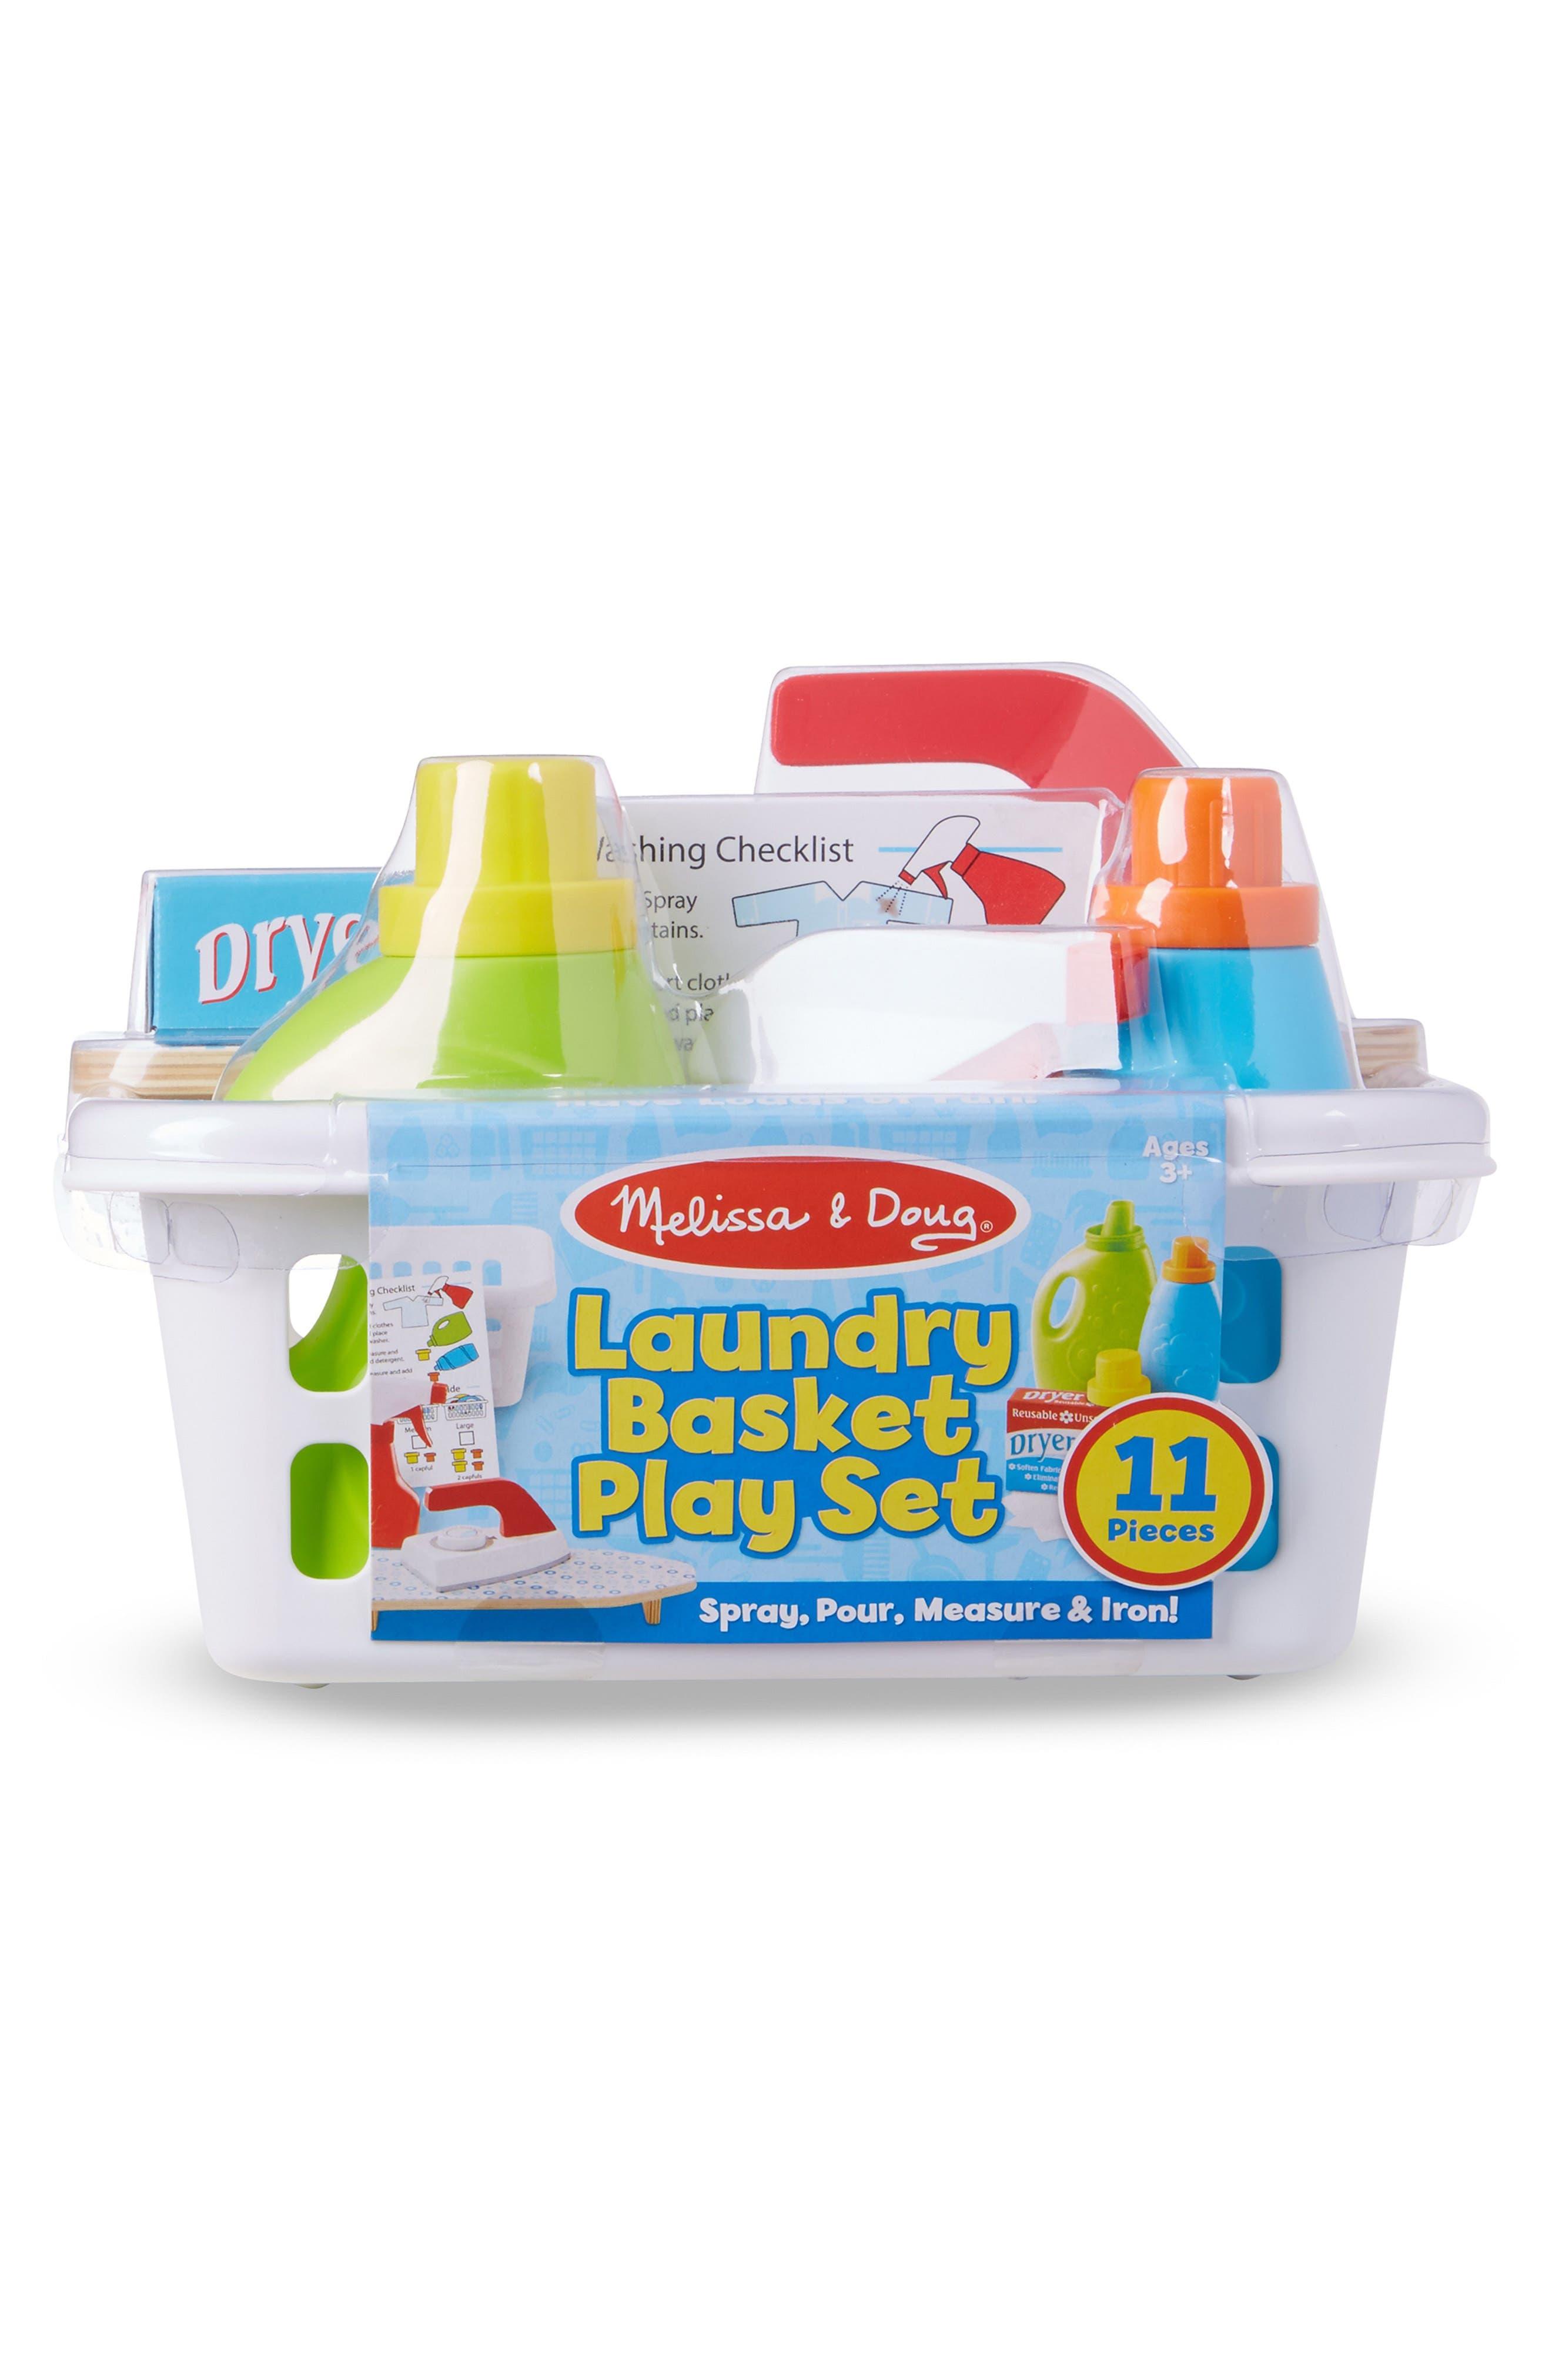 11-Piece Laundry Basket Play Set,                             Main thumbnail 1, color,                             Multi